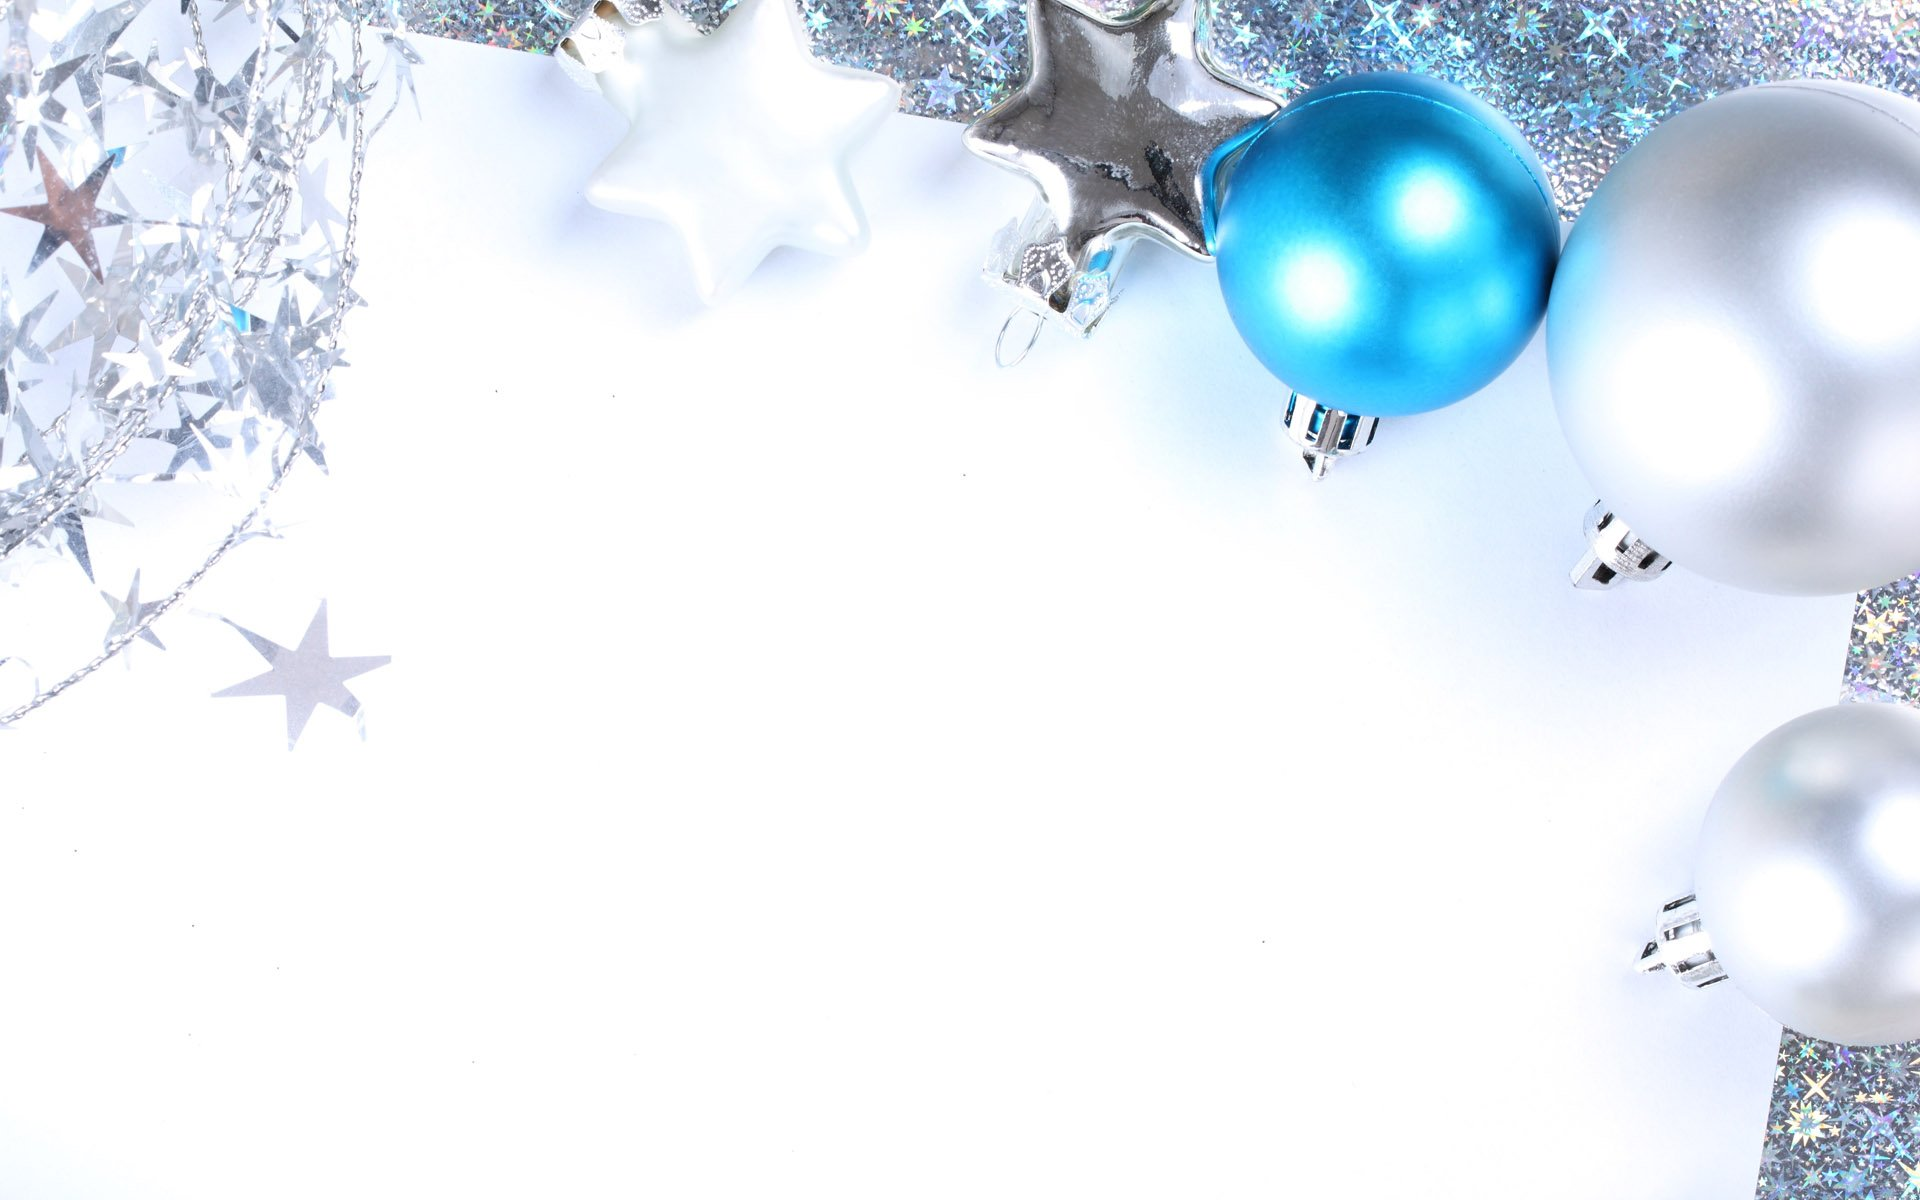 Free Fall Wallpaper For Iphone Blue Christmas Wallpaper Hd Pixelstalk Net